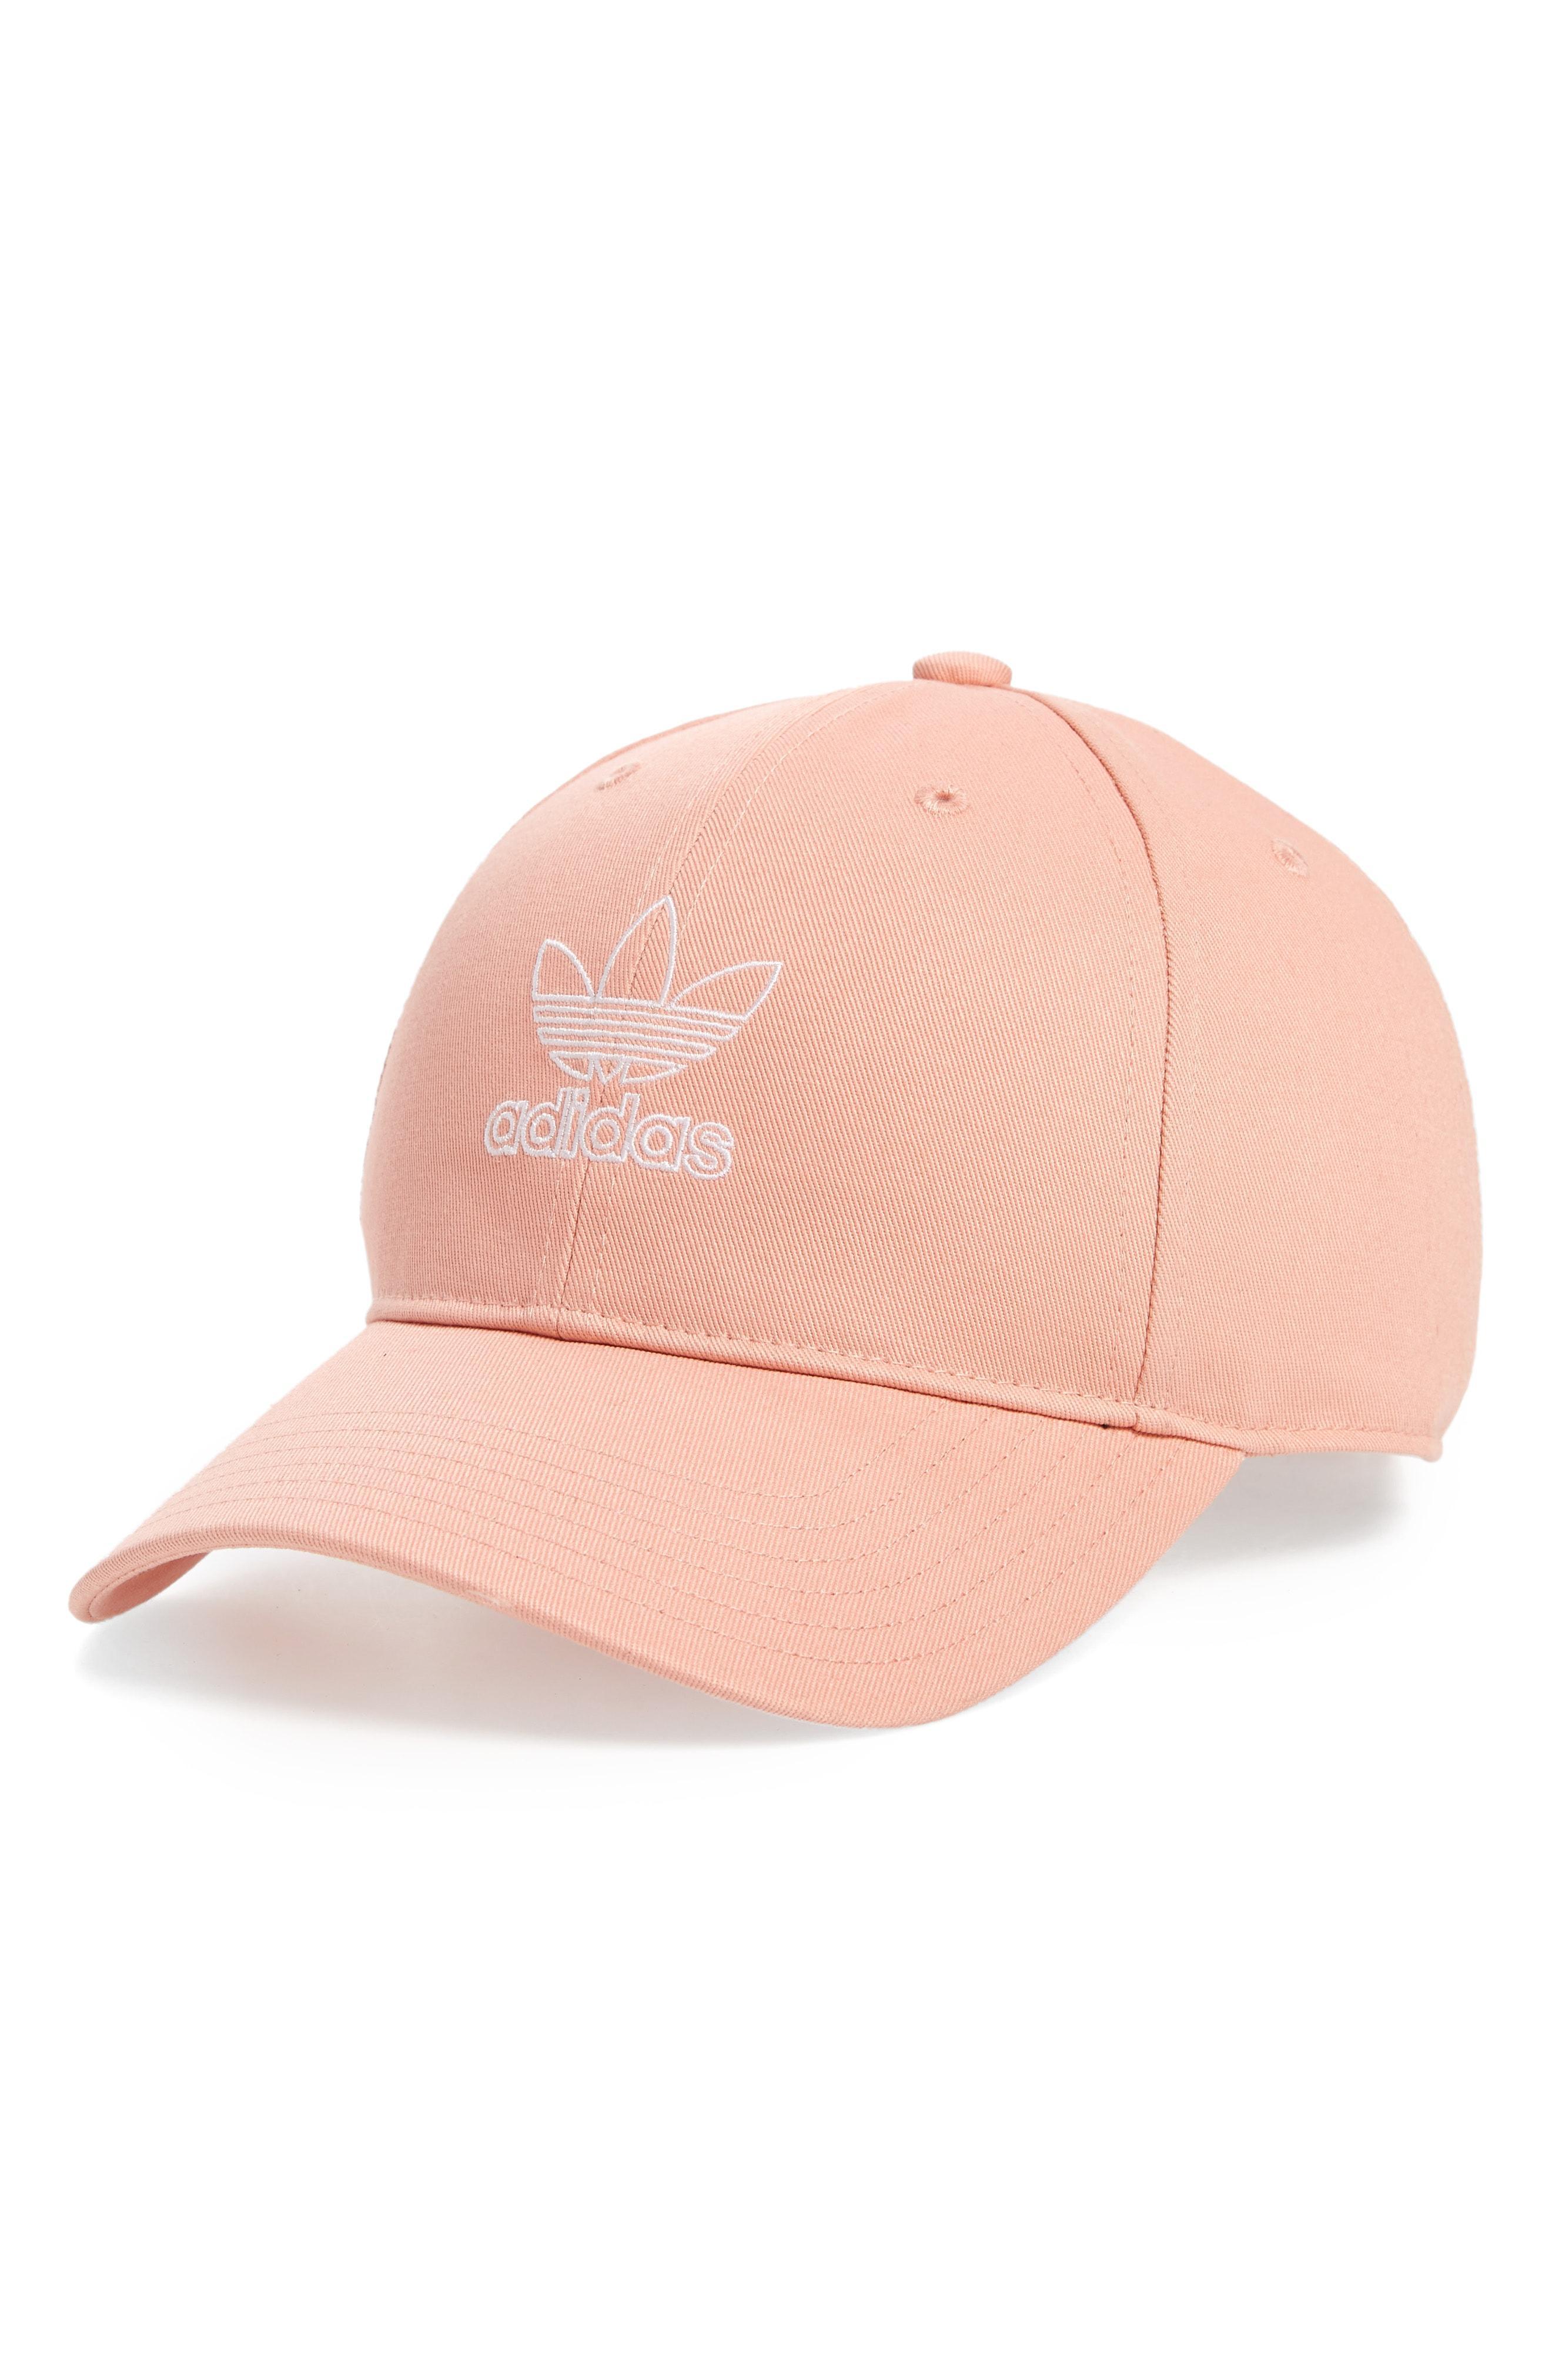 the best attitude a9fa3 ea0b7 Adidas - Pink Originals Relaxed Outline Logo Baseball Cap - Lyst. View  fullscreen